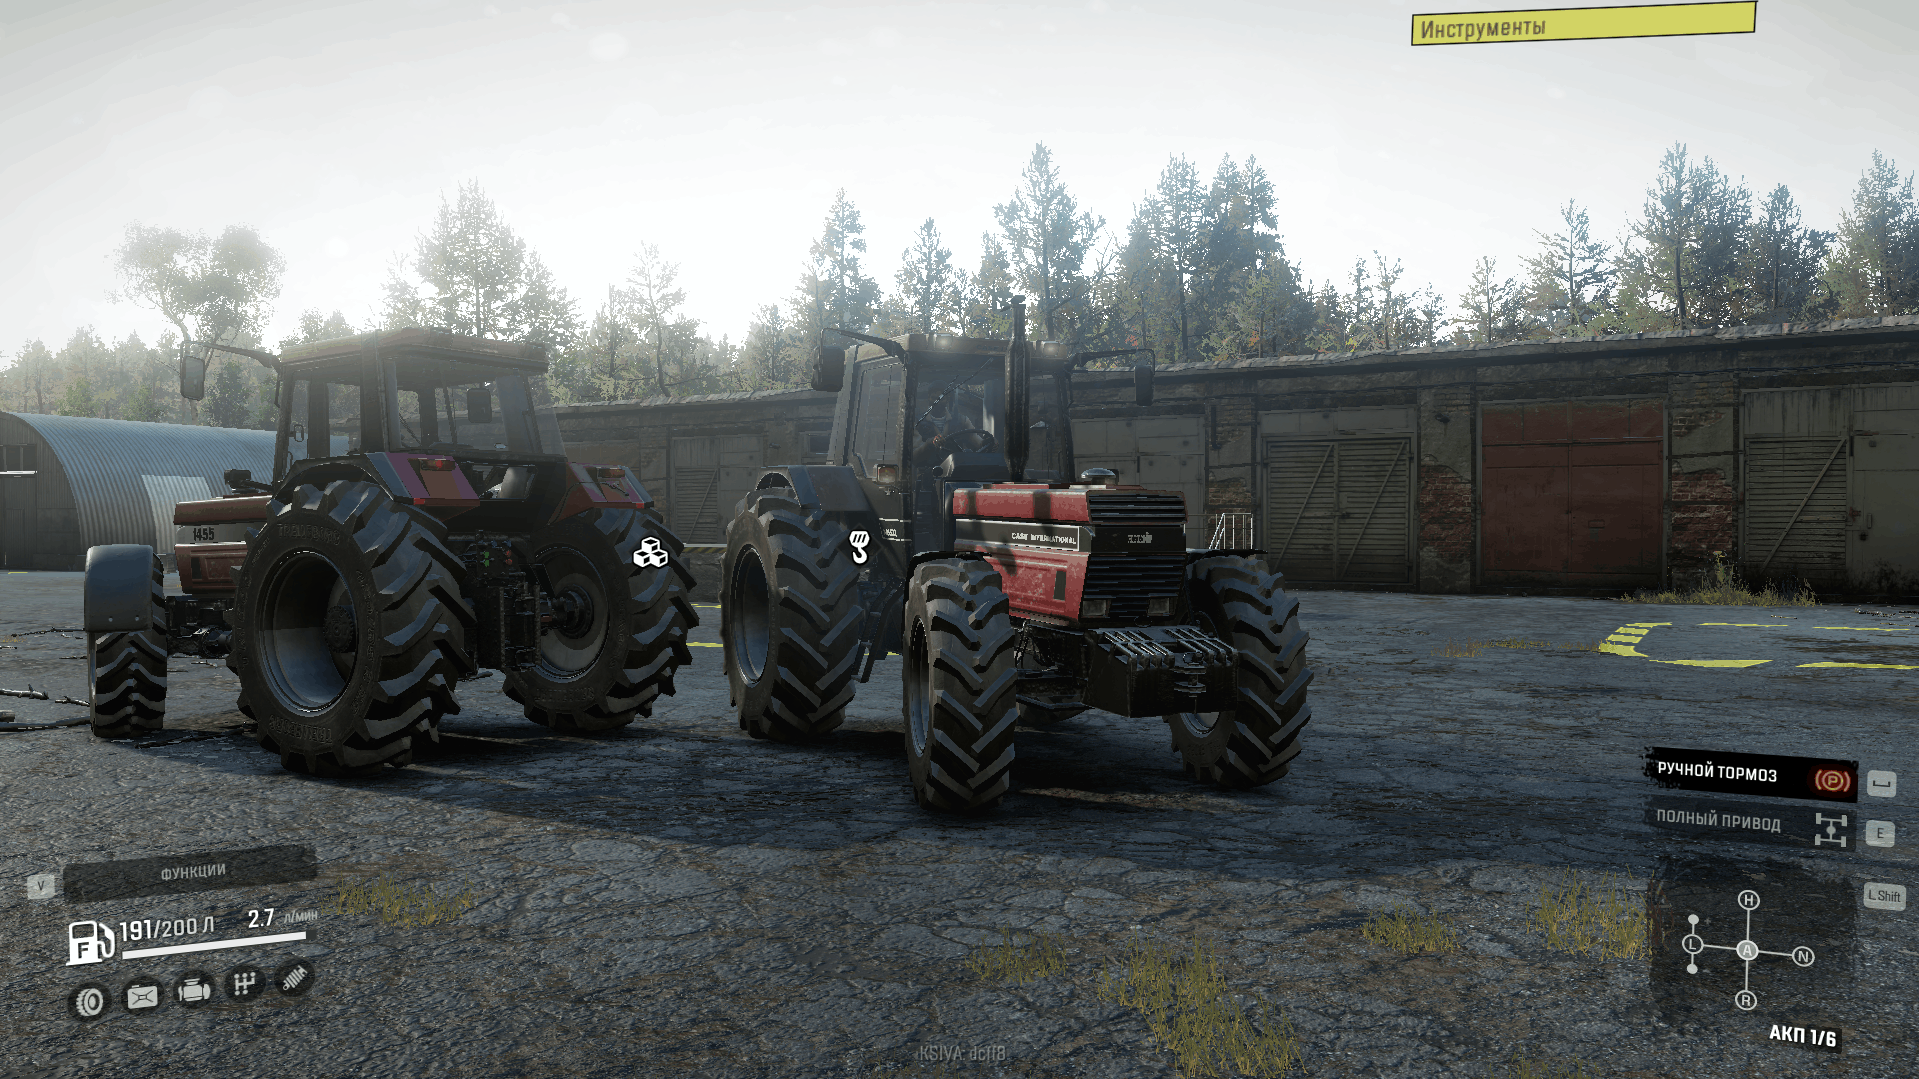 SnowRunner - Case Ih 1455 XL Tractor V2.1